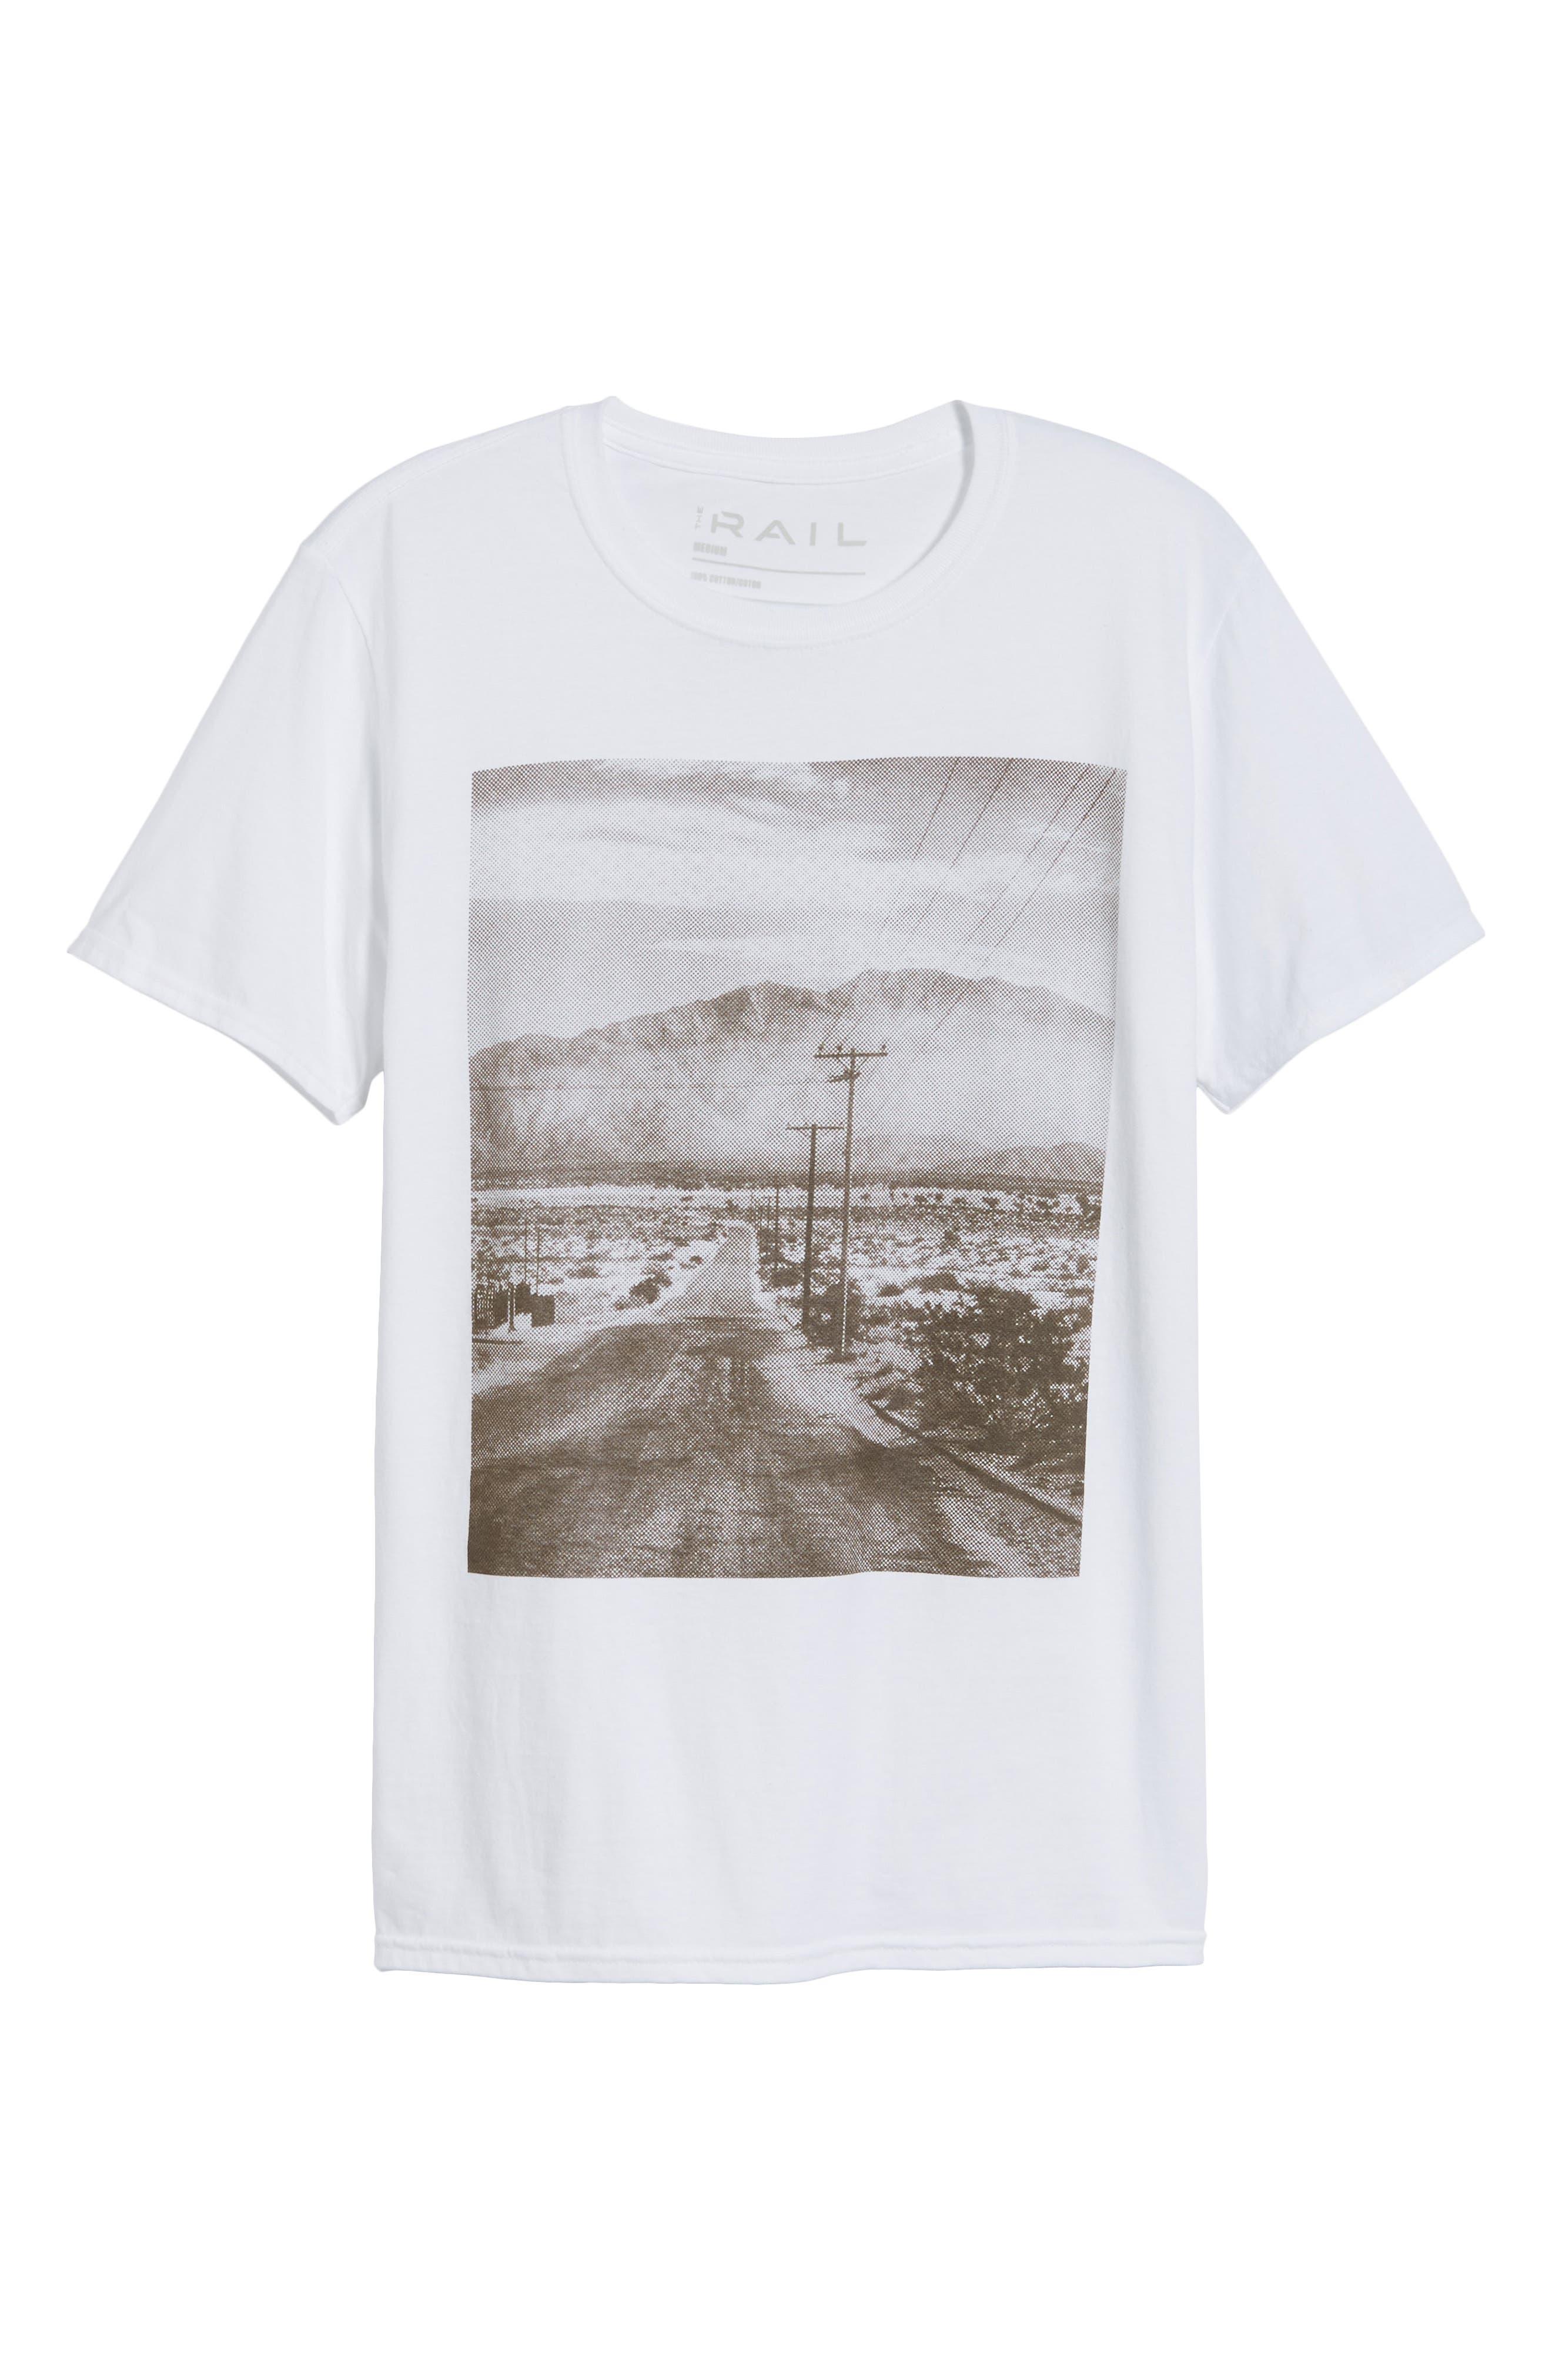 Deserted Road Photo T-Shirt,                             Alternate thumbnail 6, color,                             100